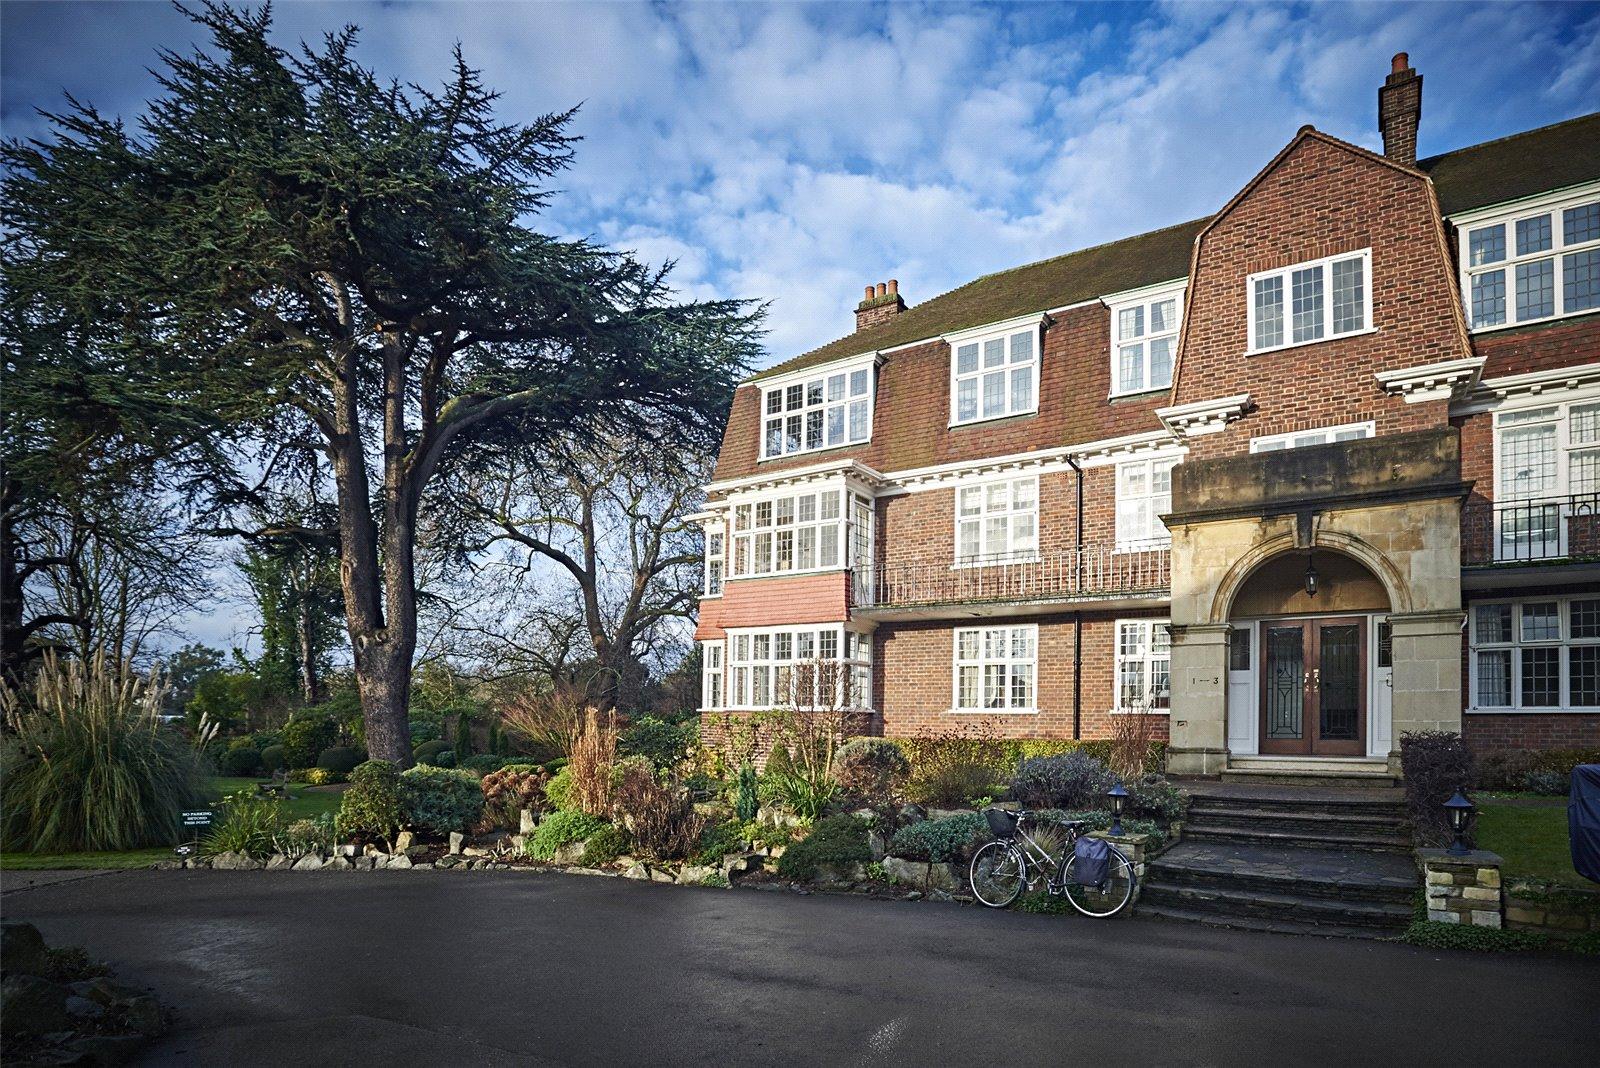 Queensberry House, Friars Lane, TW9 1NT - Antony Roberts